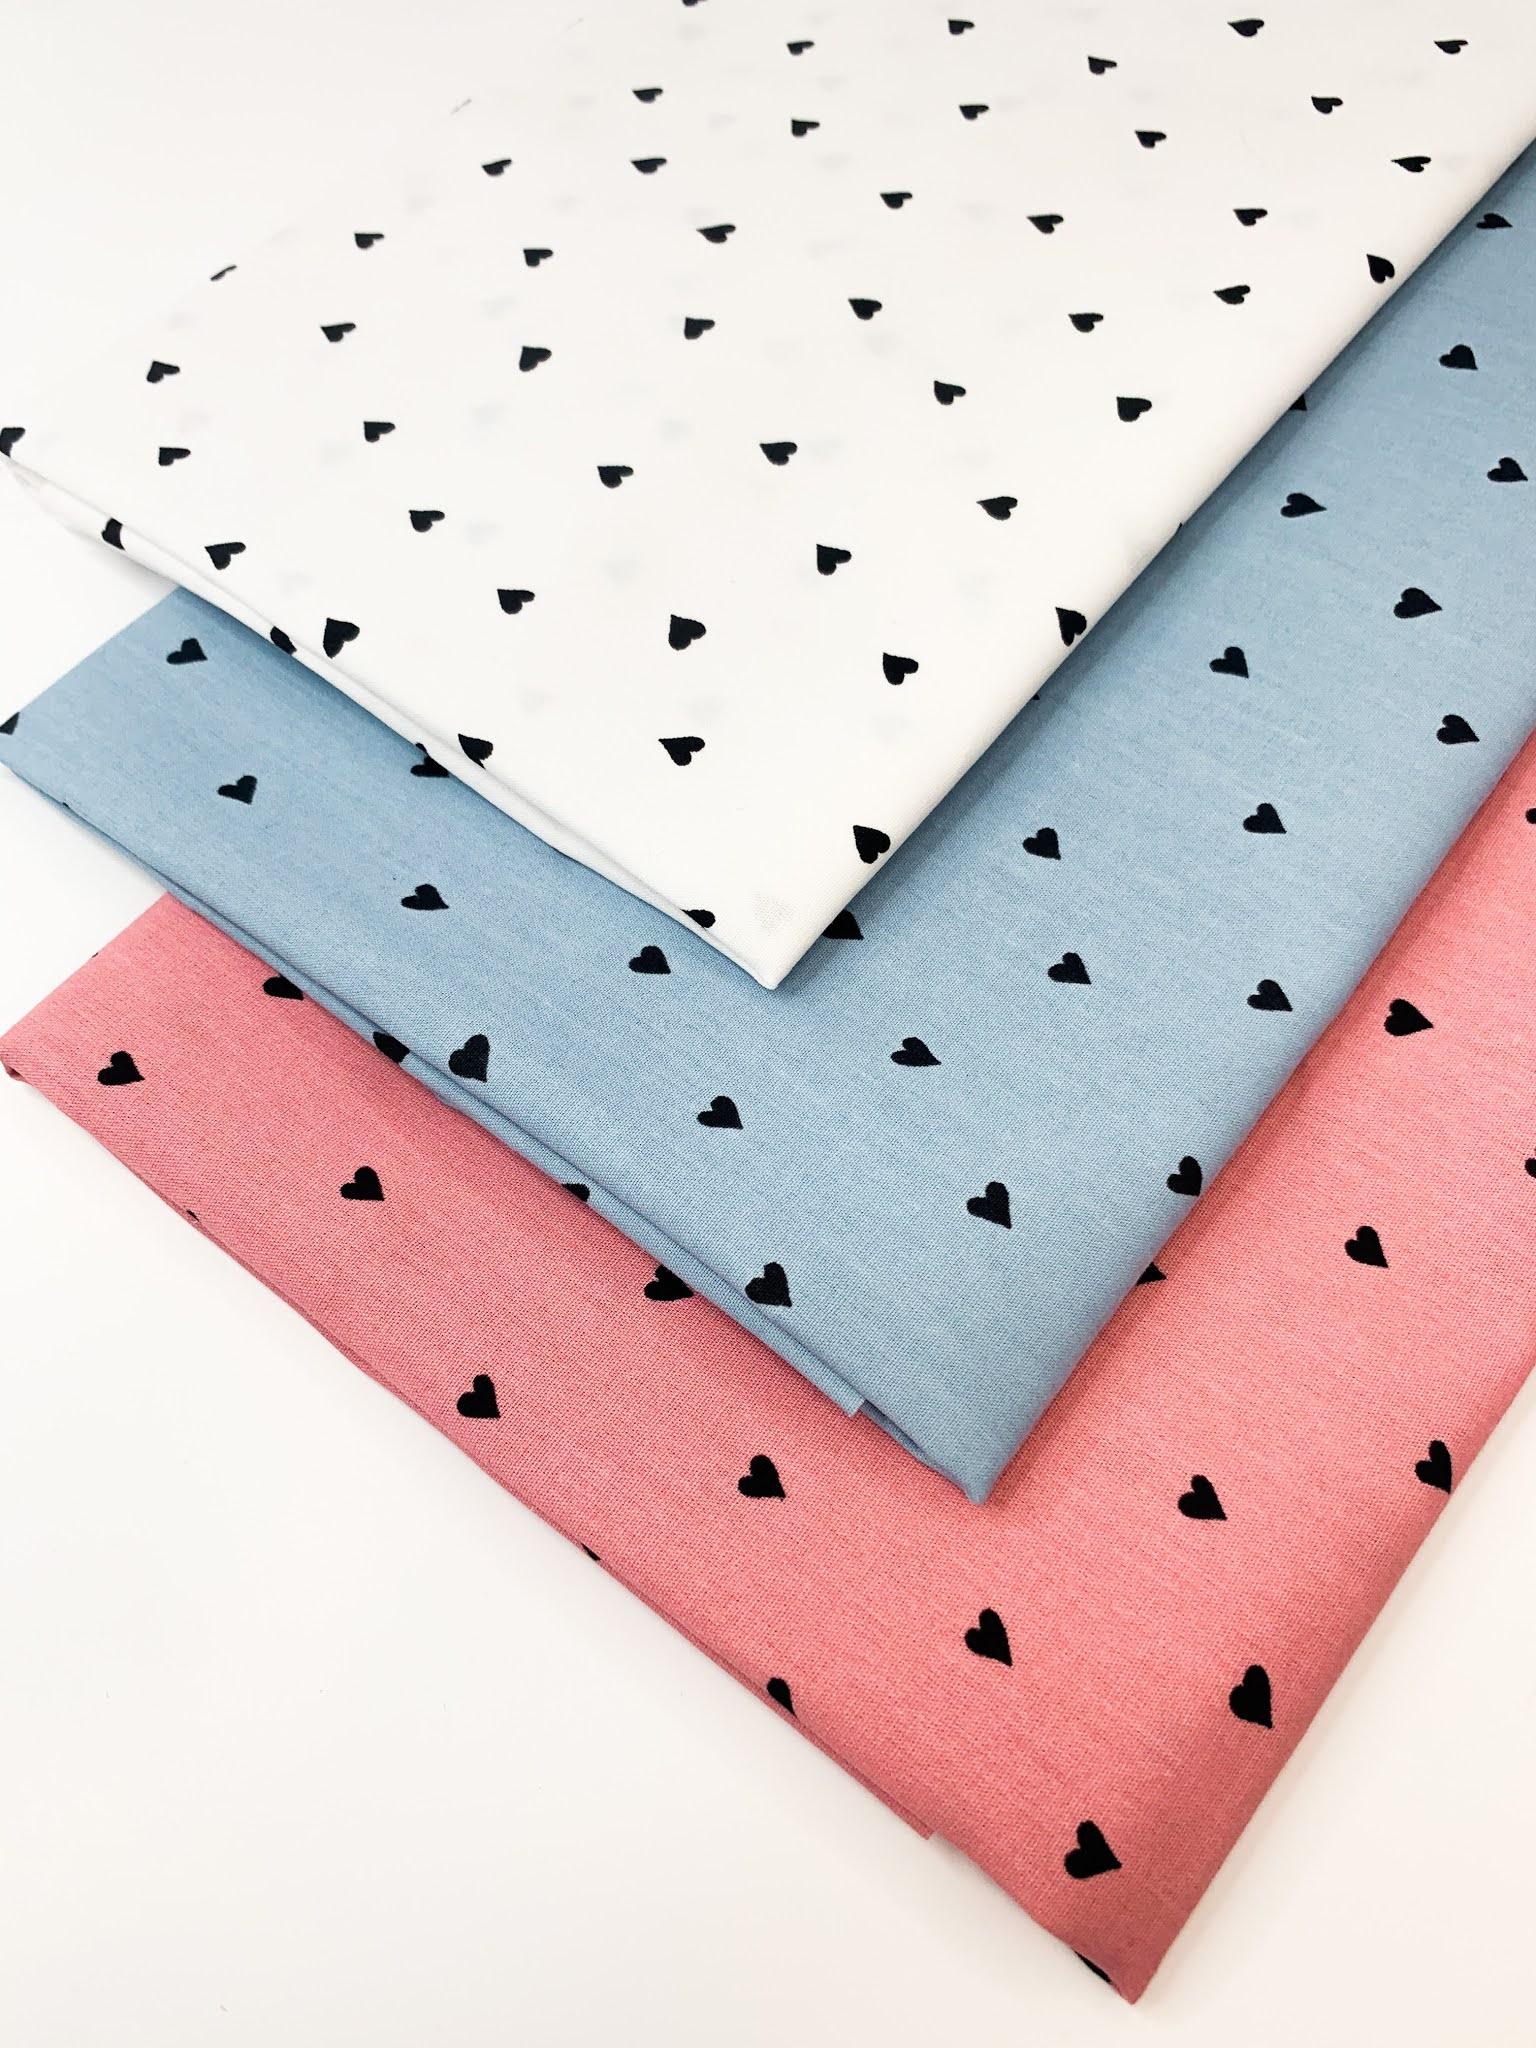 Sammi's Scrunchies 3 cotton fabrics